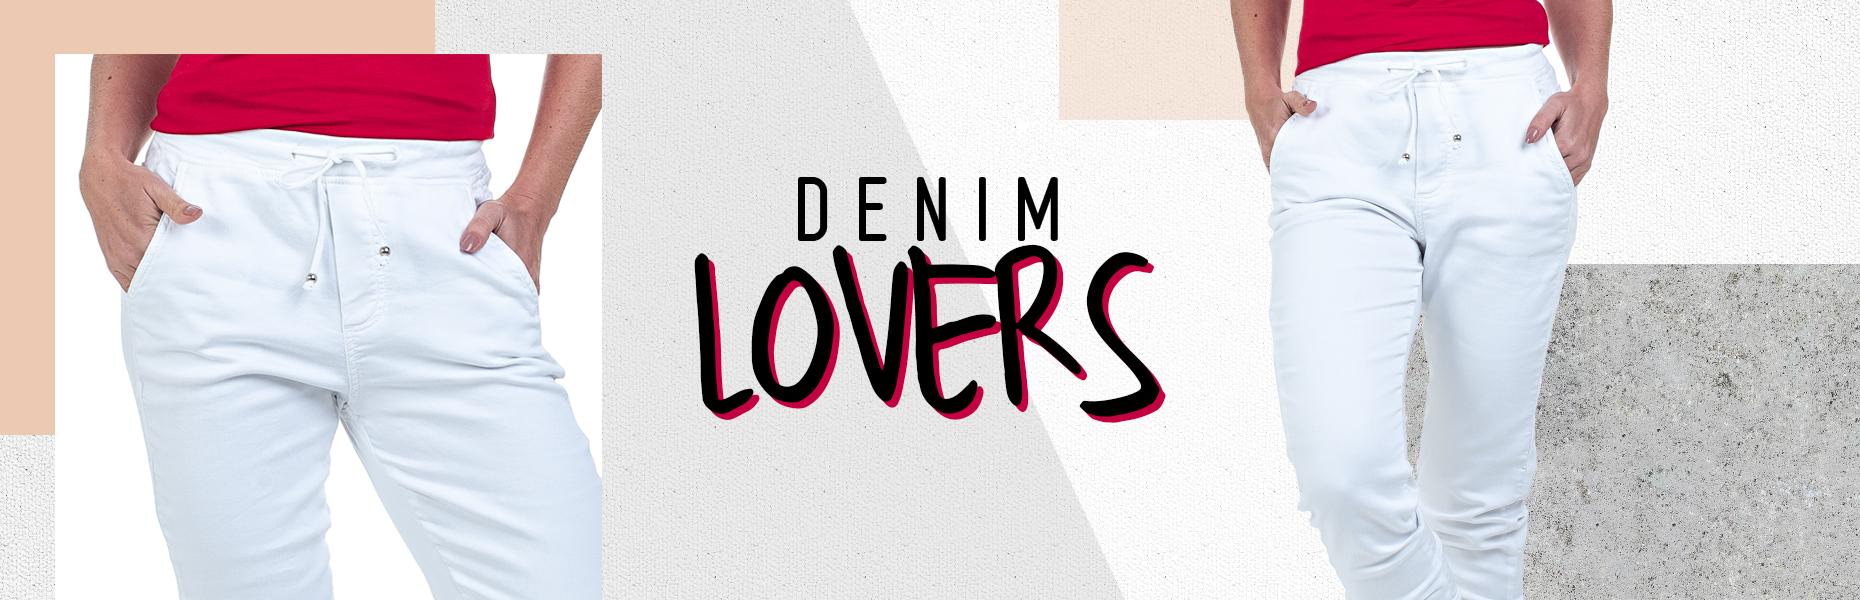 Denim Lovers Joggers